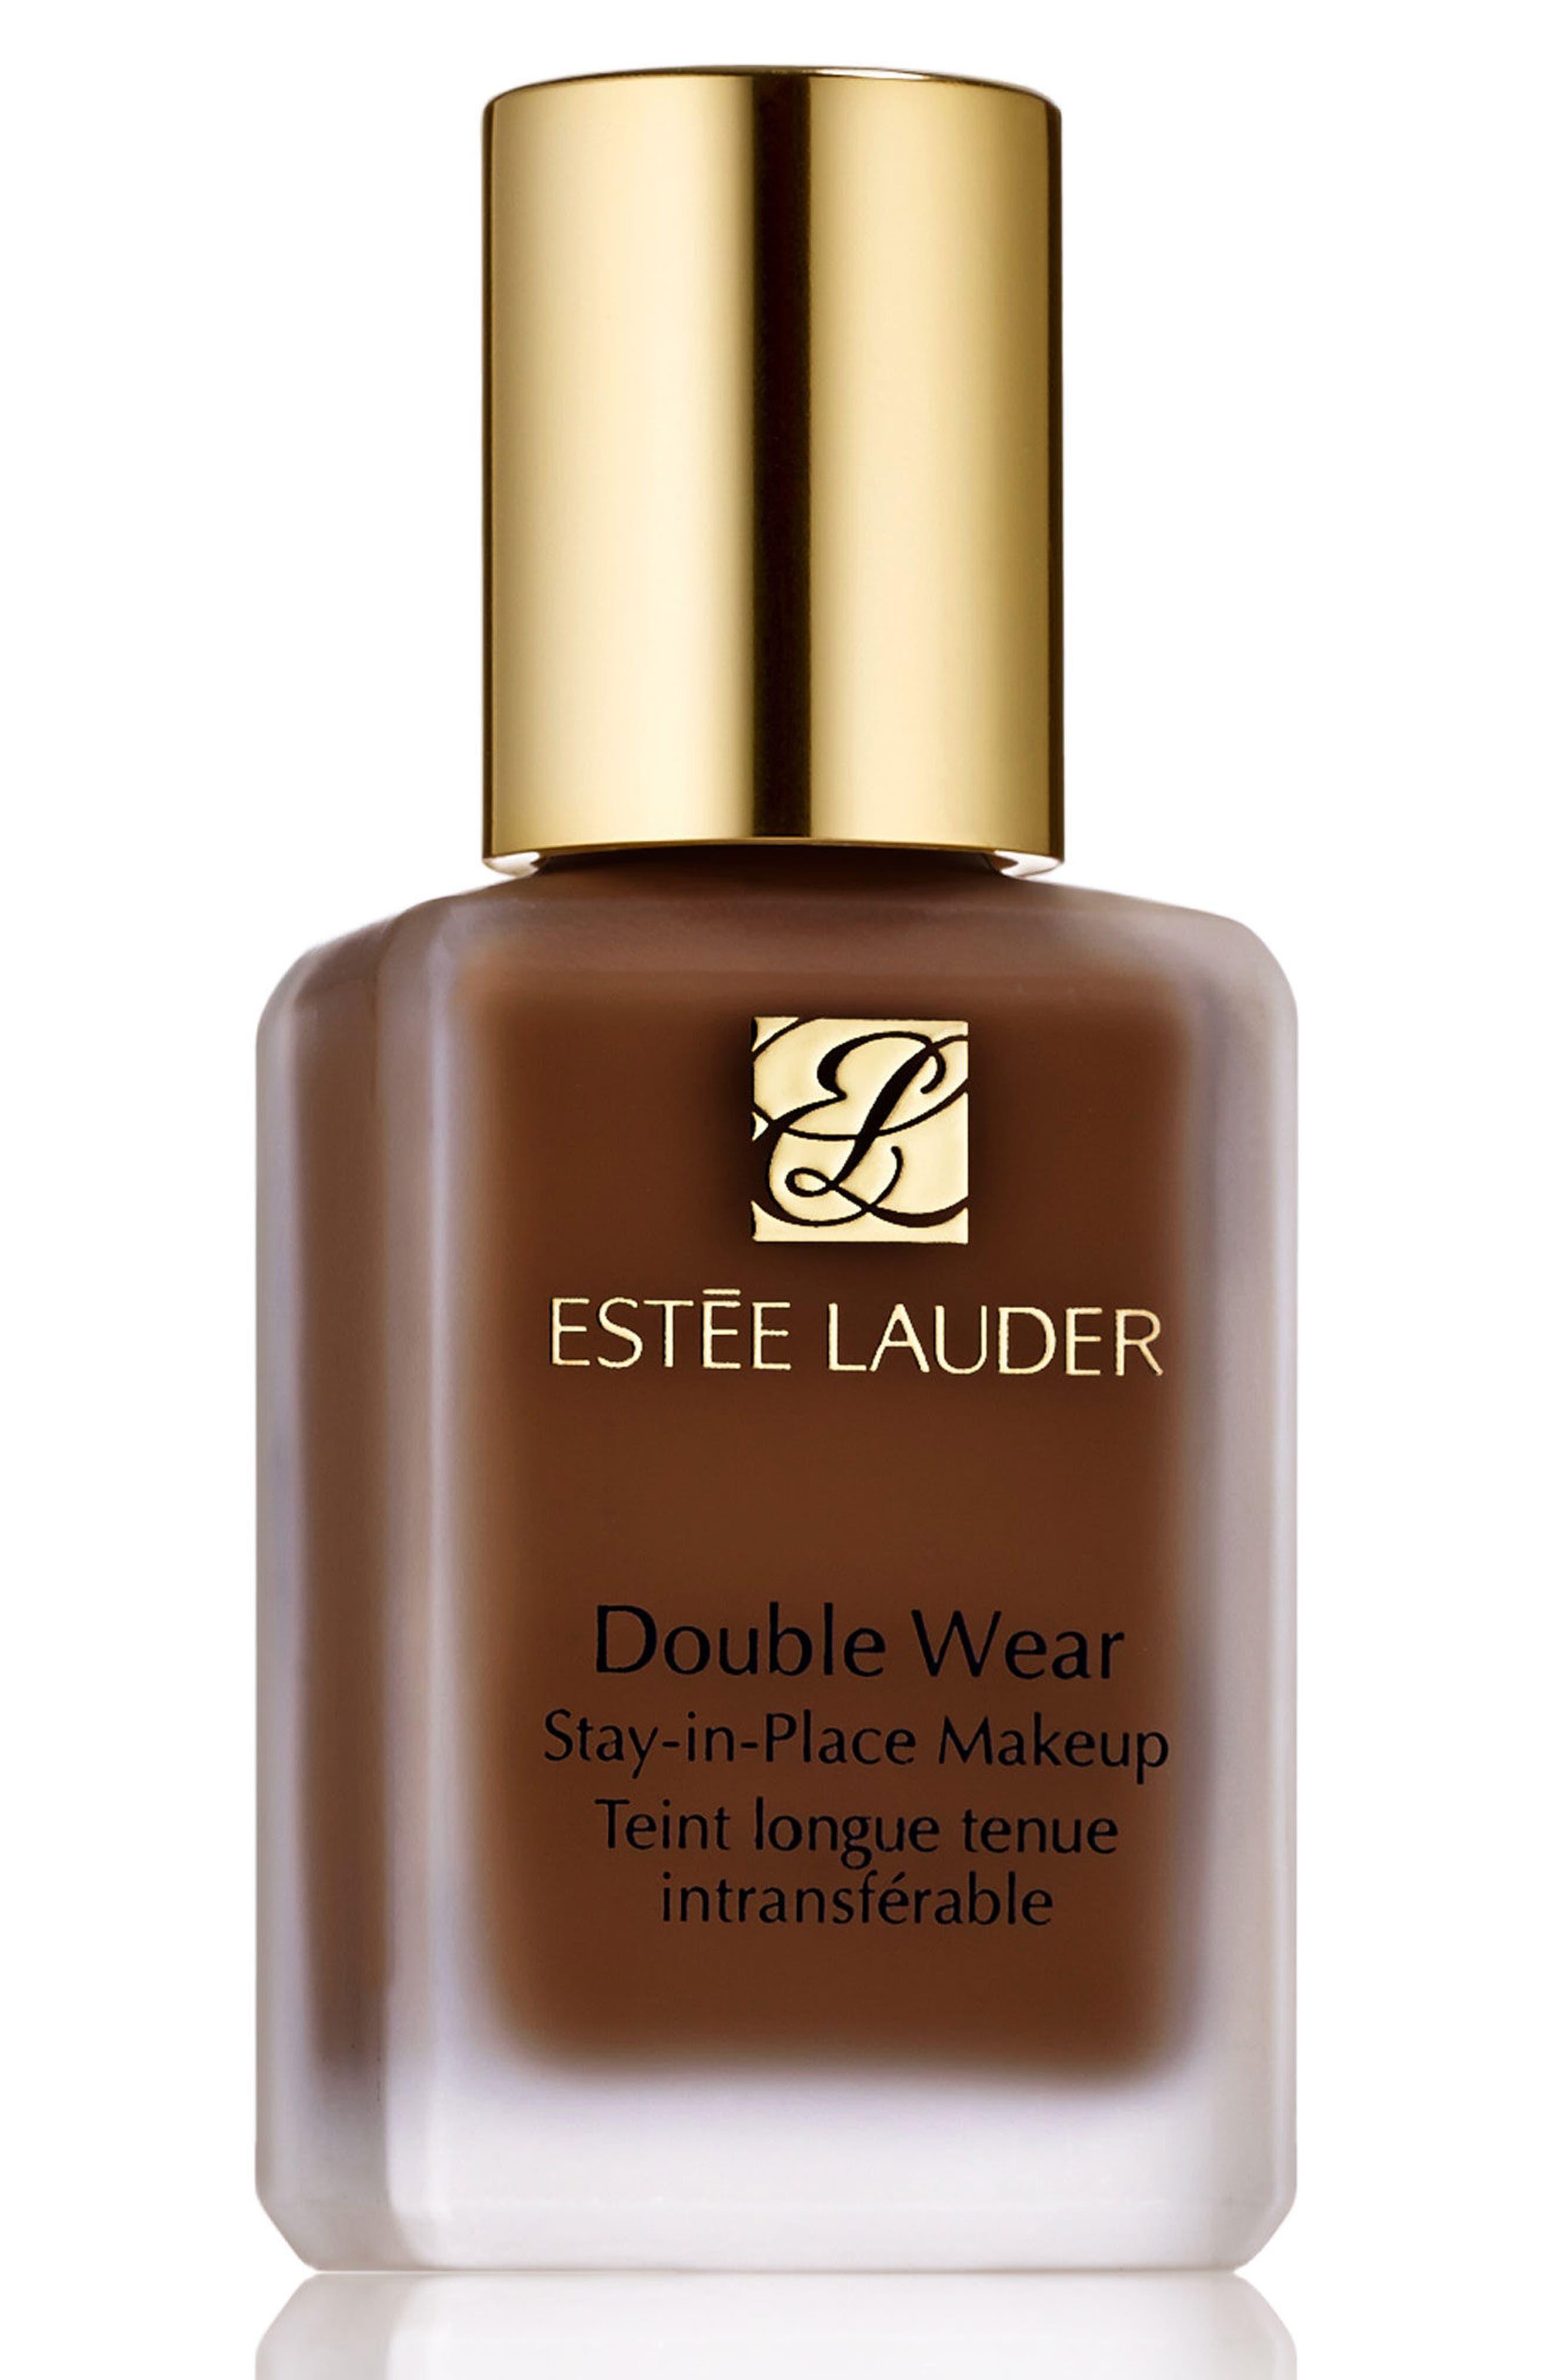 Estee Lauder Double Wear Stay-In-Place Liquid Makeup - 8C1 Rich Java